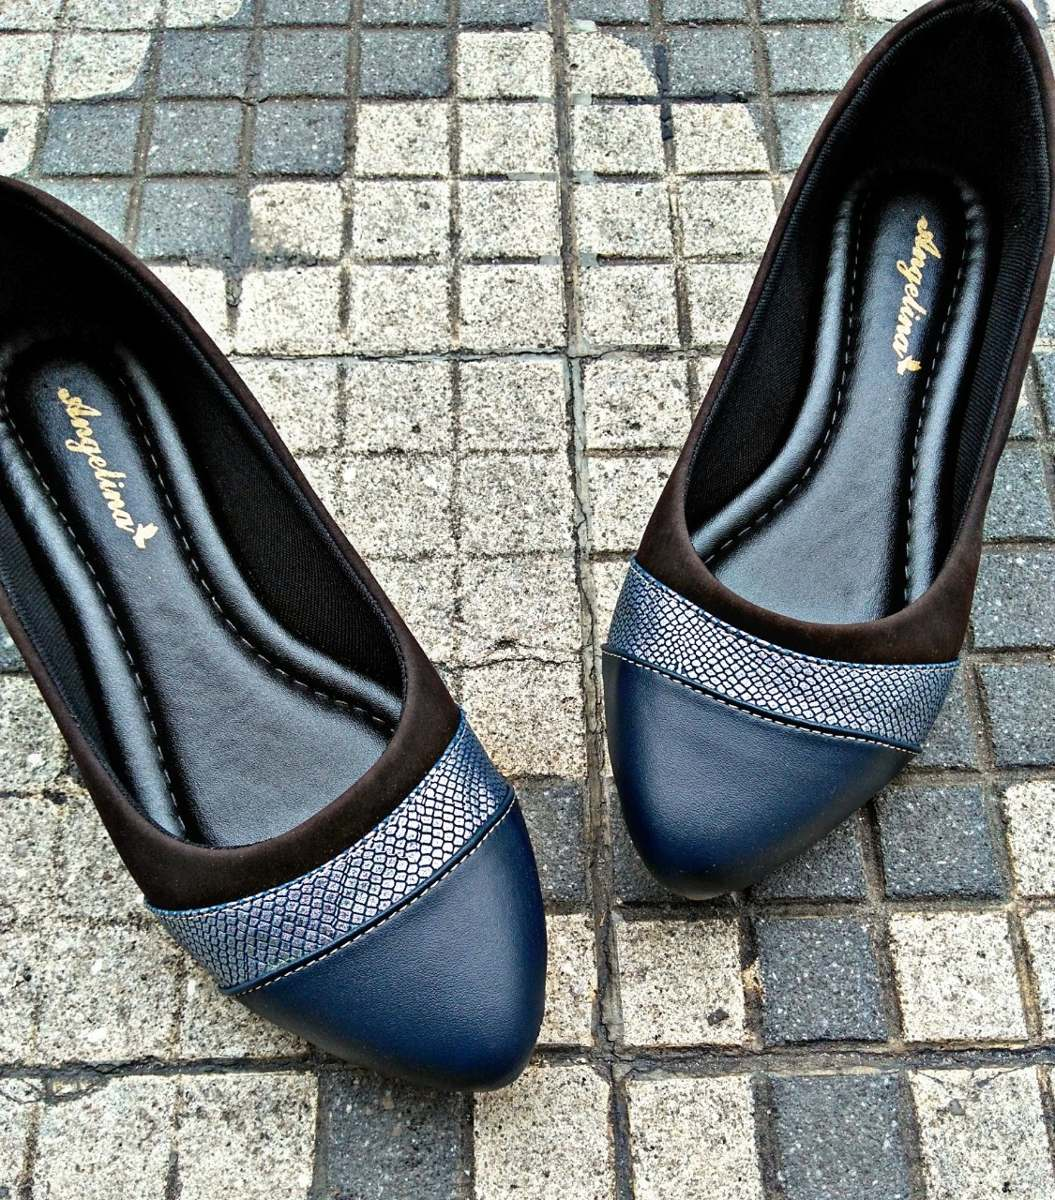 5206b8b3d Katia Calçados - R$ 85,00 em Mercado Livre